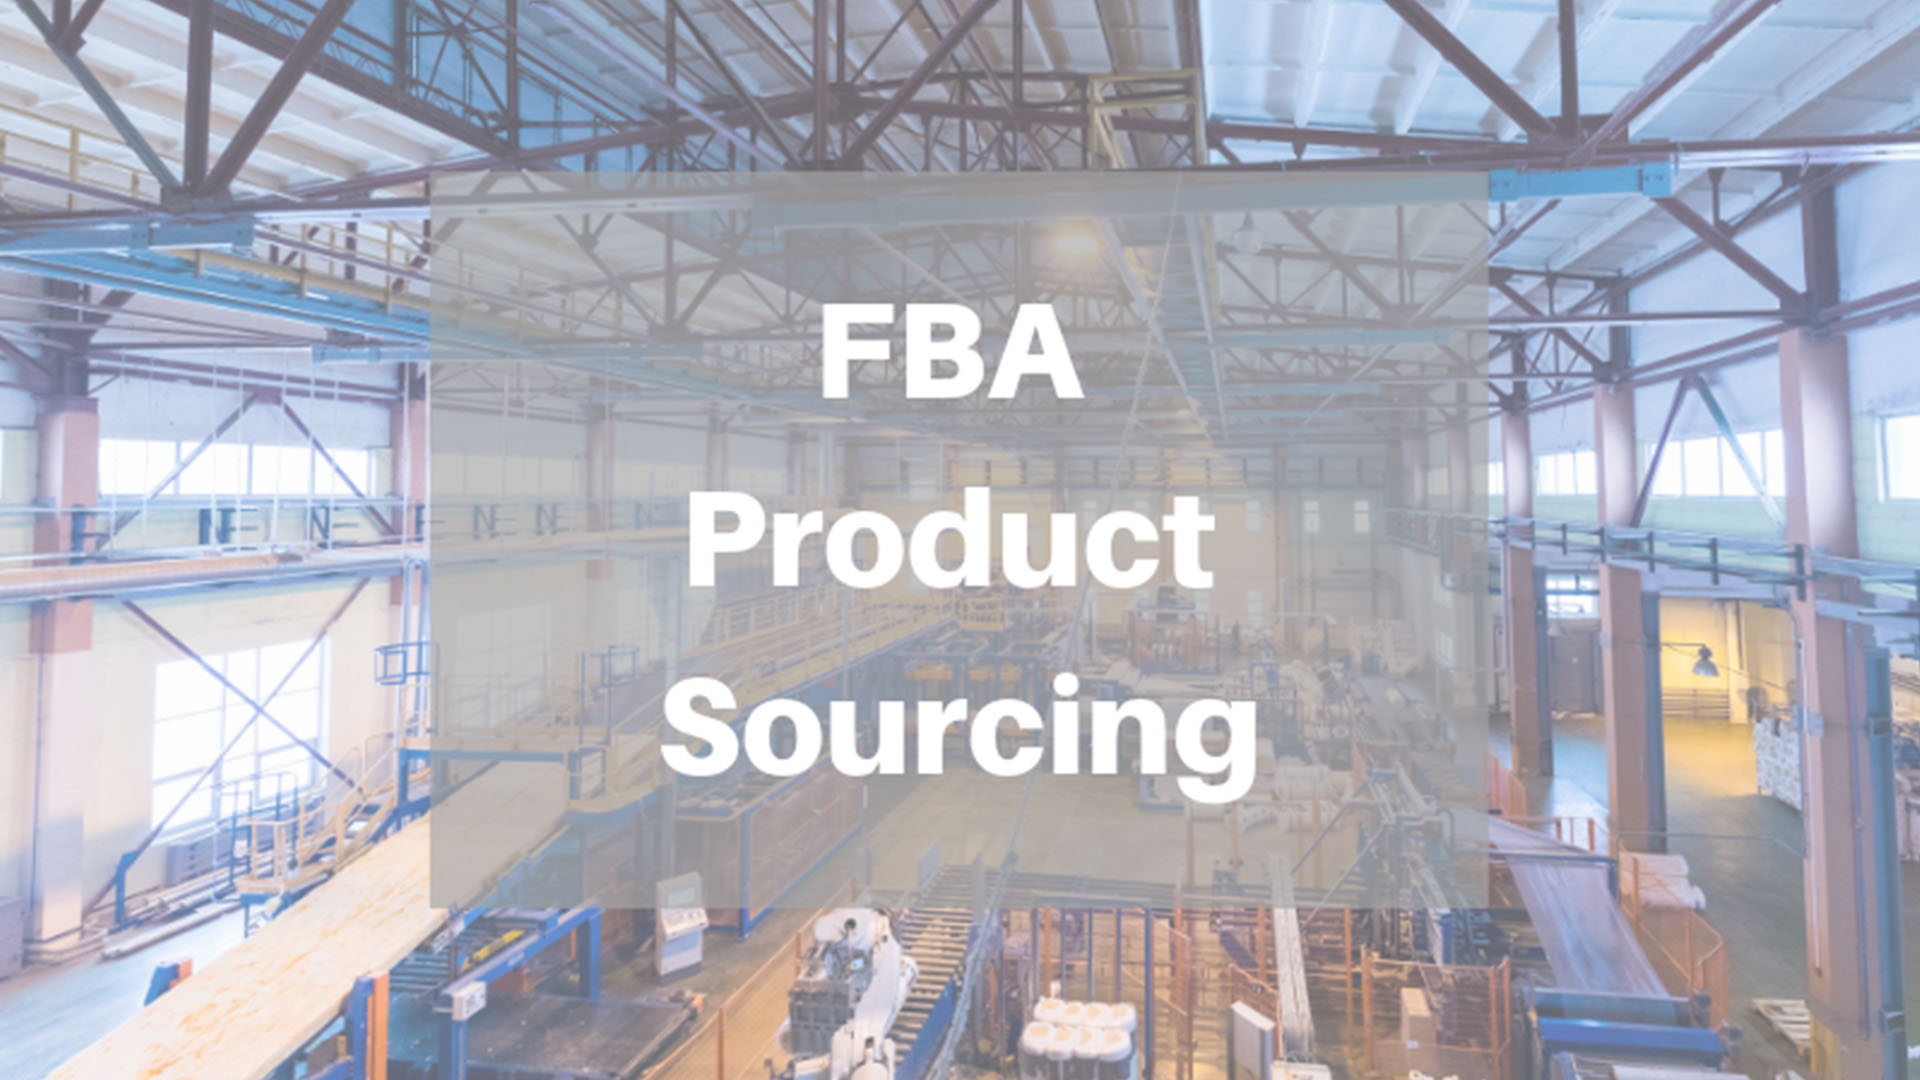 Amazon FBA Product Sourcing | Options Other Than Alibaba